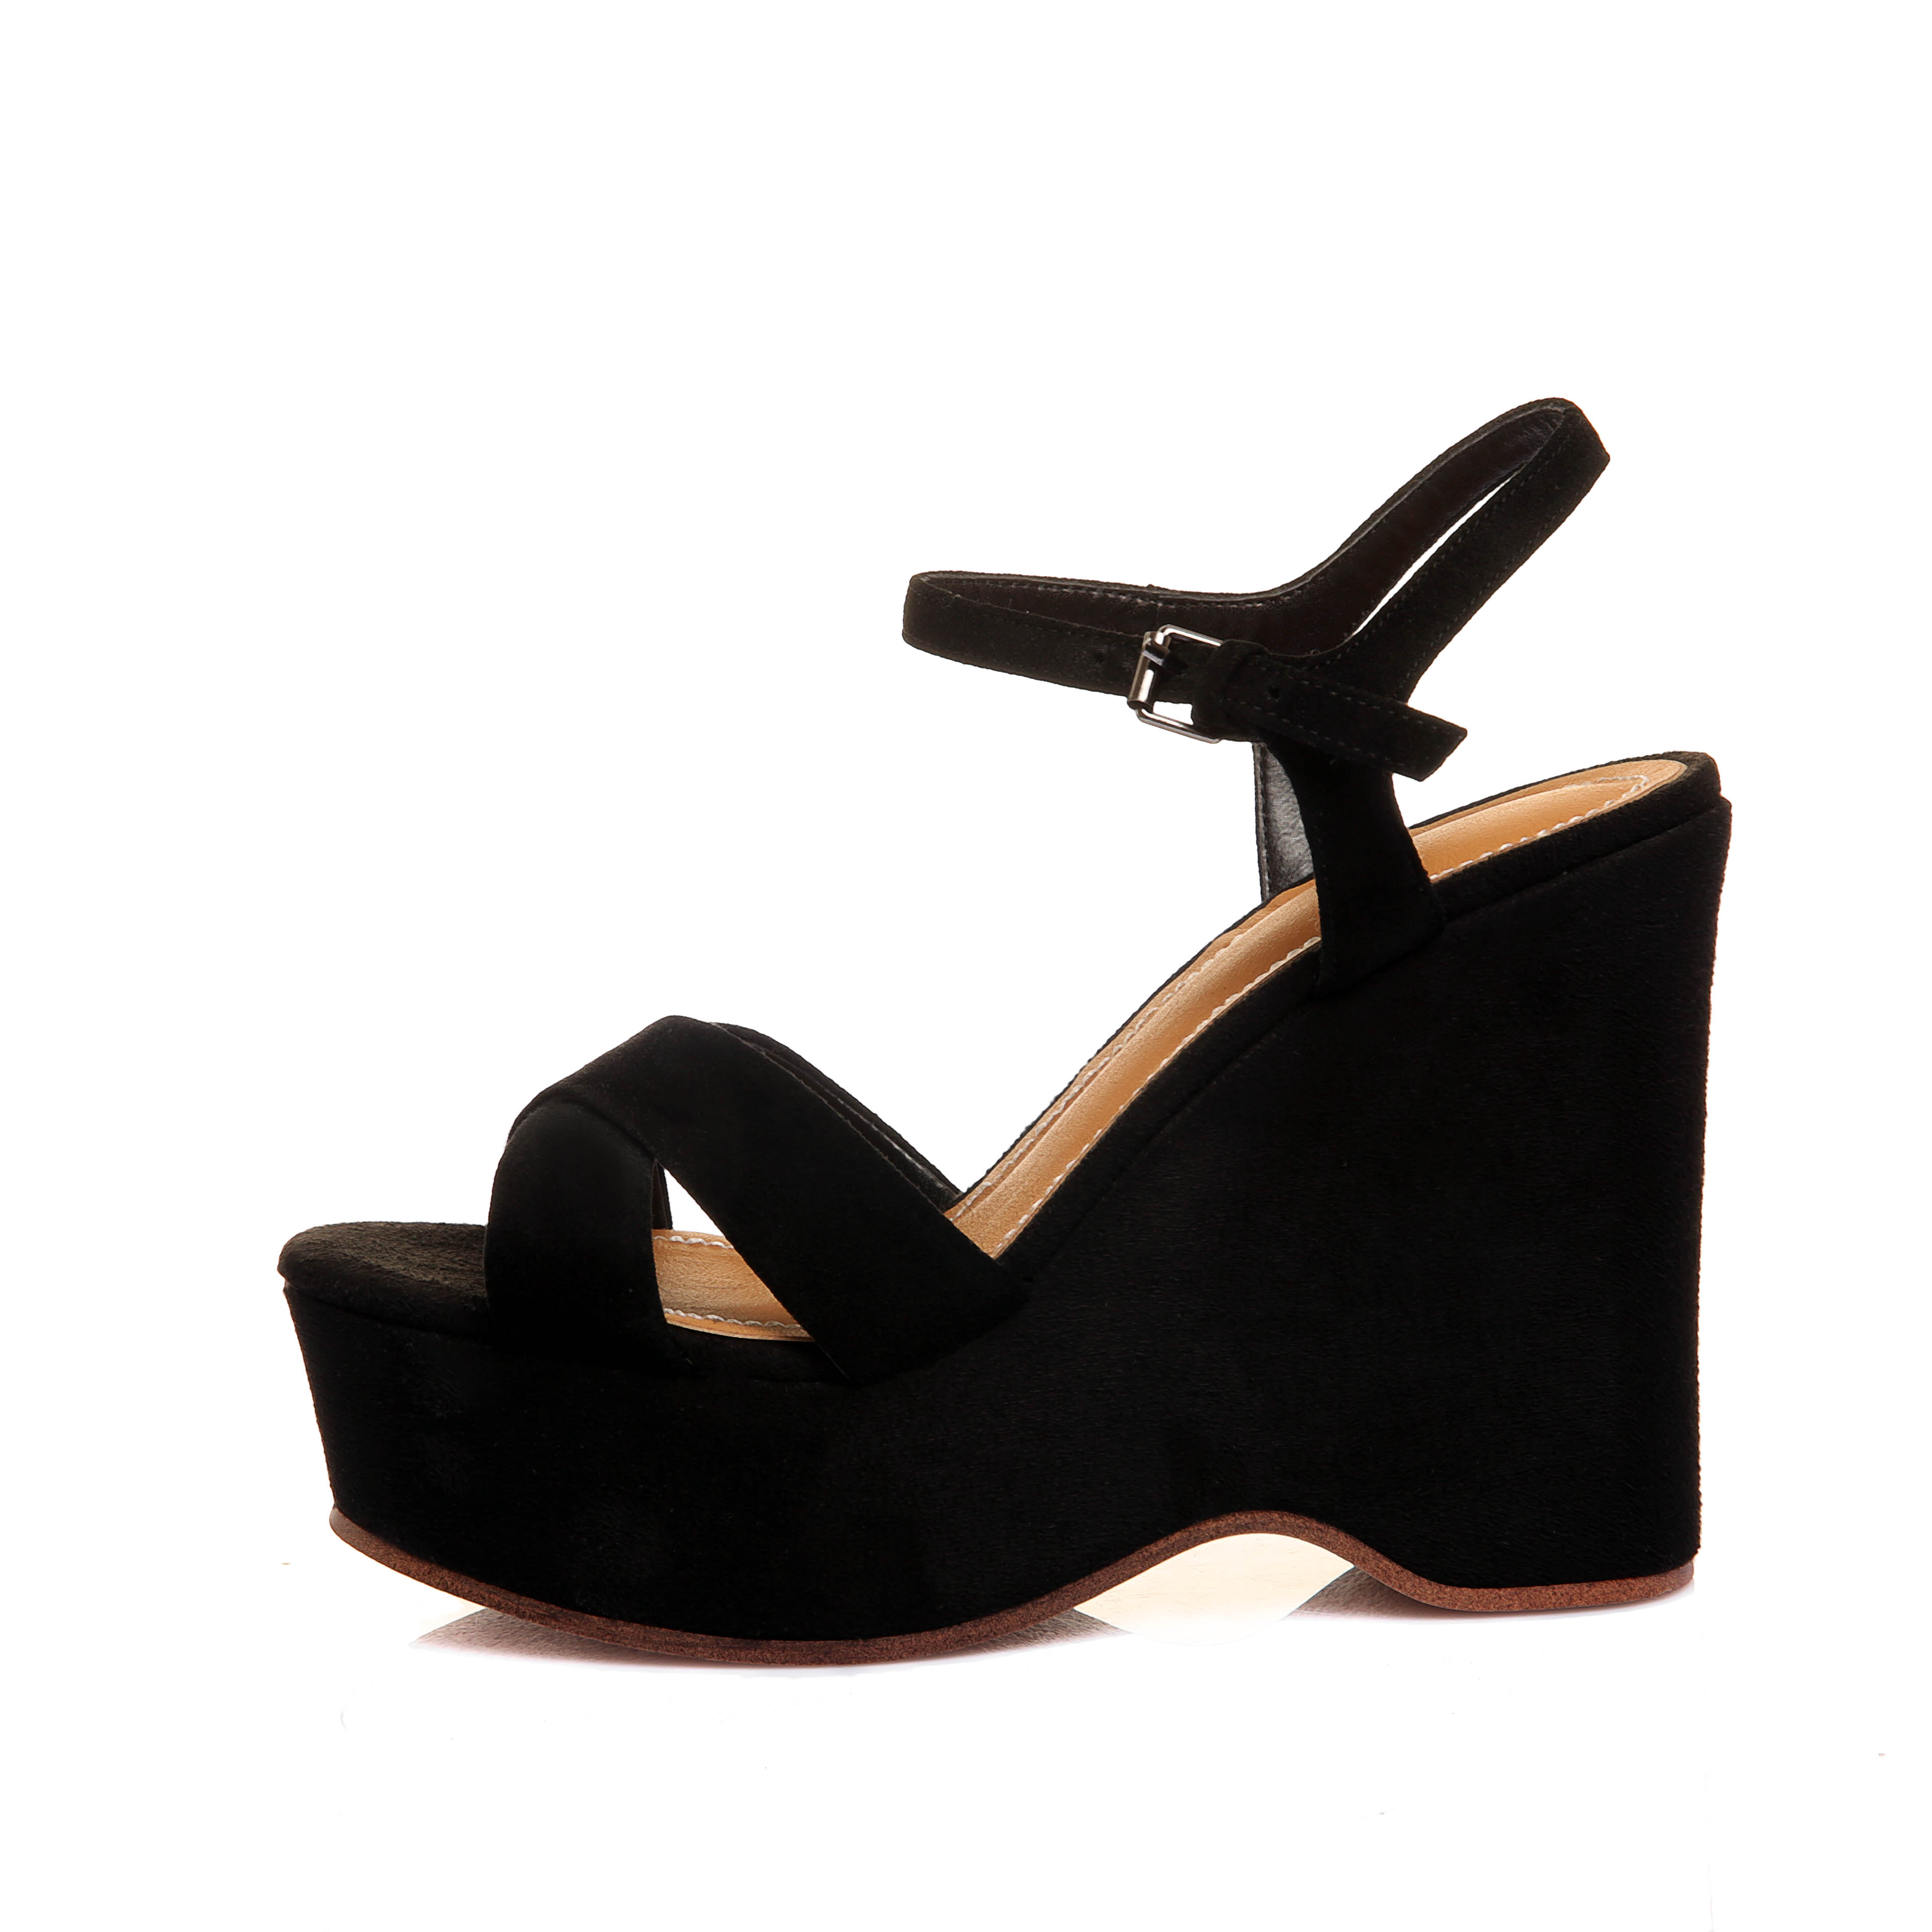 5e87631ef63b1 US  60 - Arden Furtado 2018 summer high heels buckle strap genuine suede  casual platform wedges fashion sandals shoes buckle strap girls -  www.ardenfurtado. ...